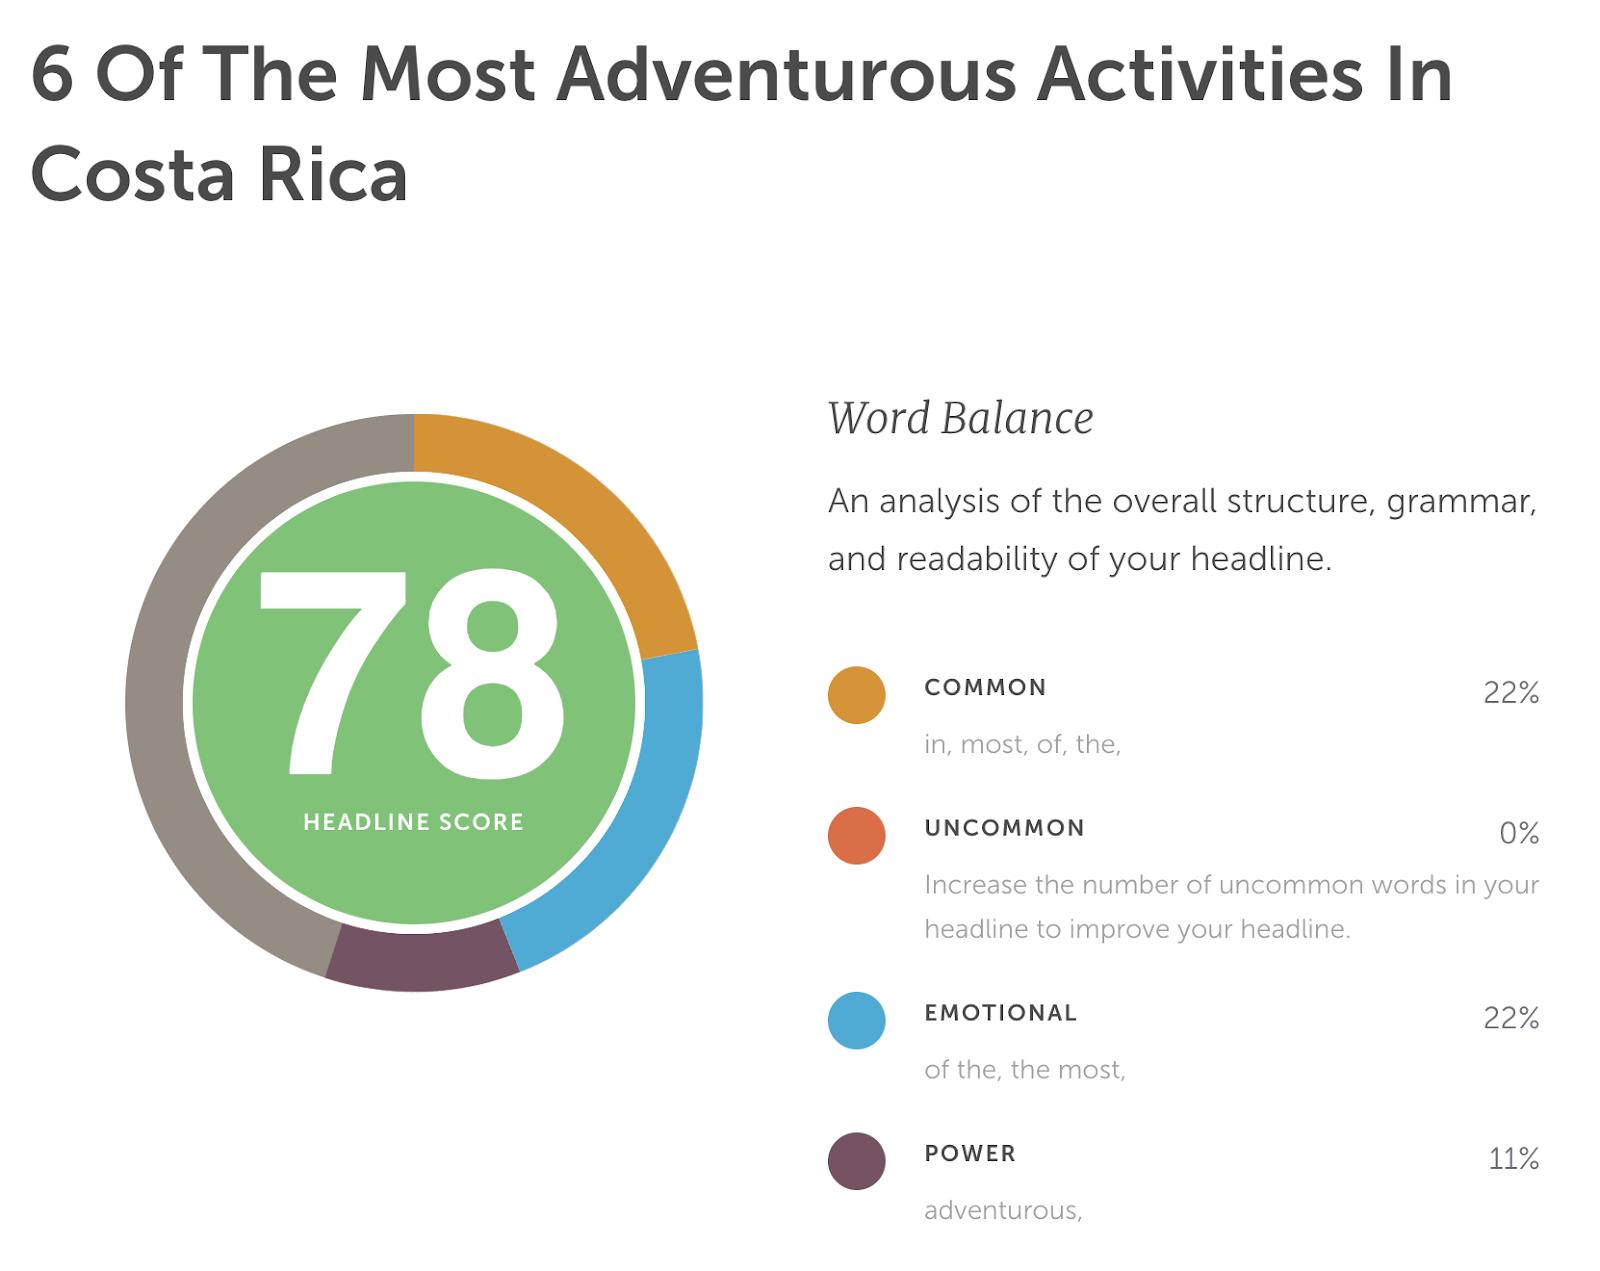 6 of the most adventurous activities in costa rica